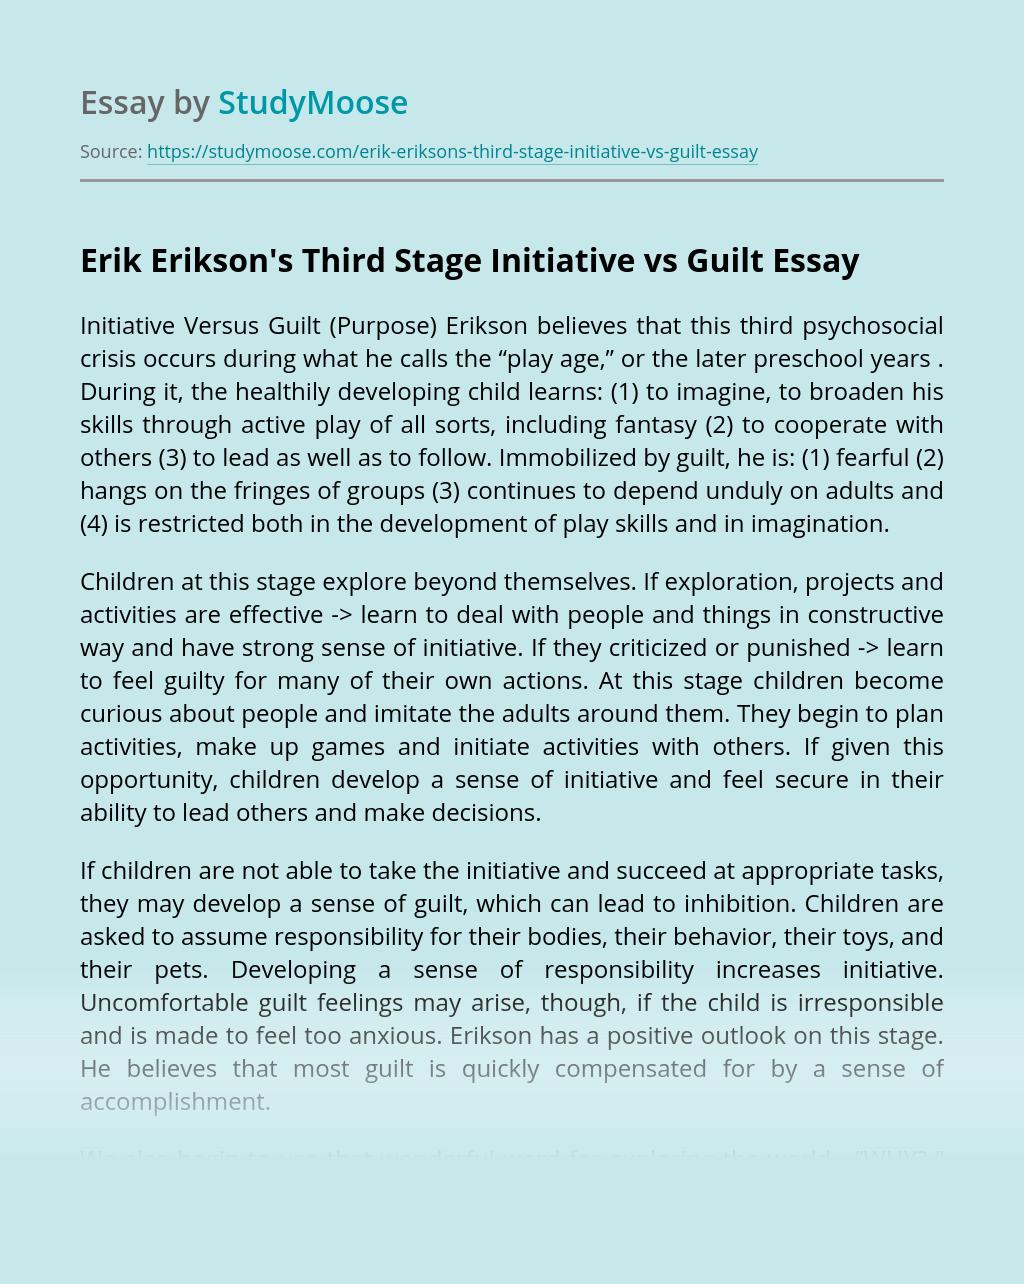 Erik Erikson's Third Stage Initiative vs Guilt